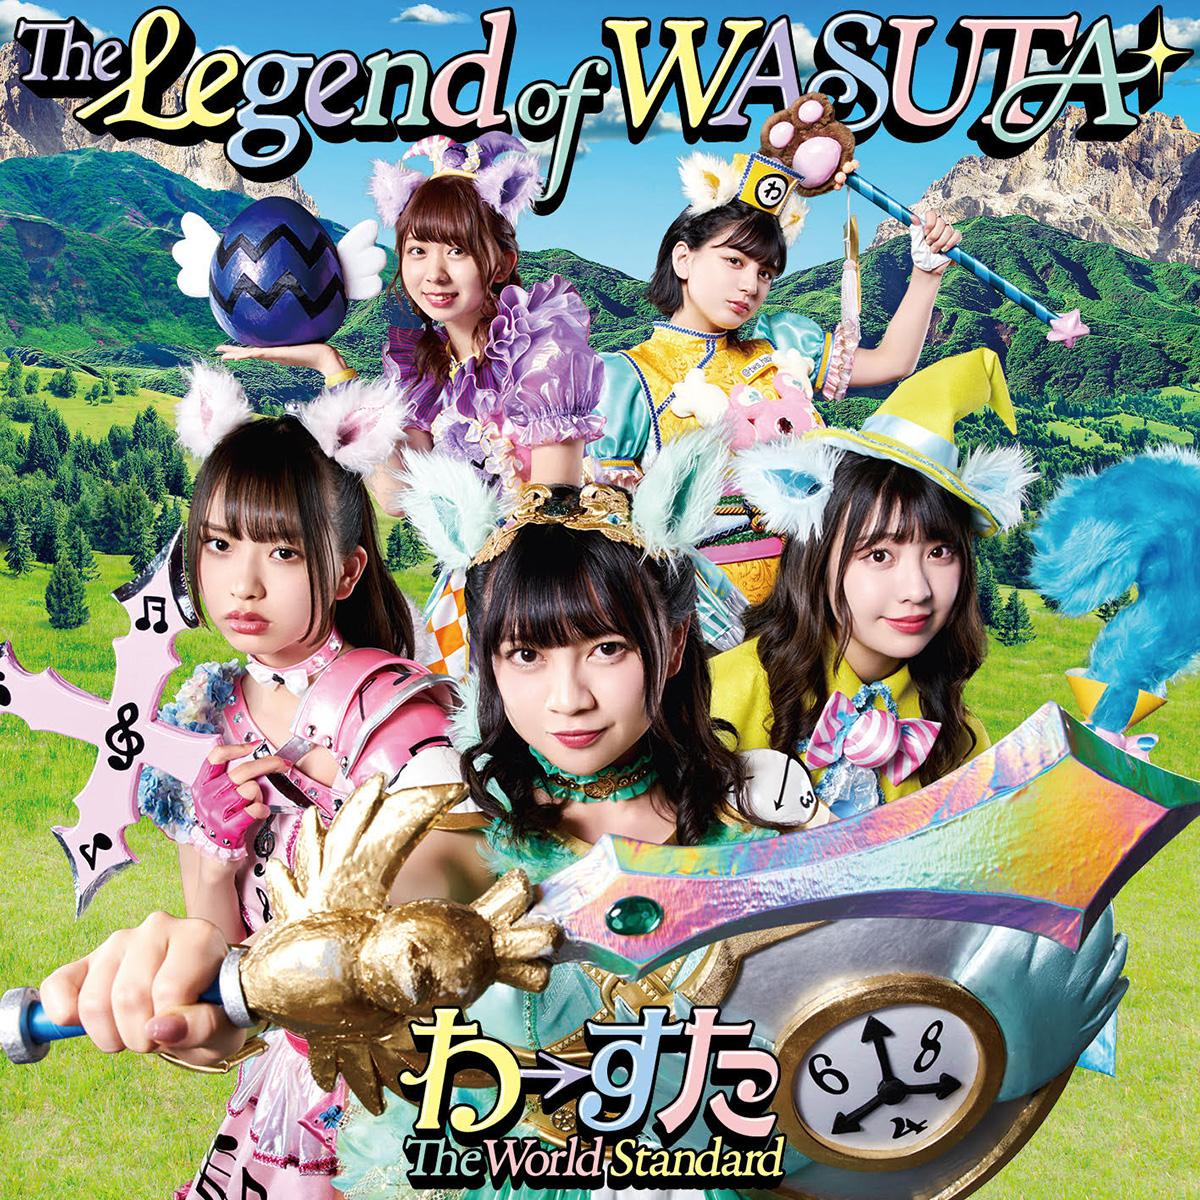 Wasuta Legend of Wasuta